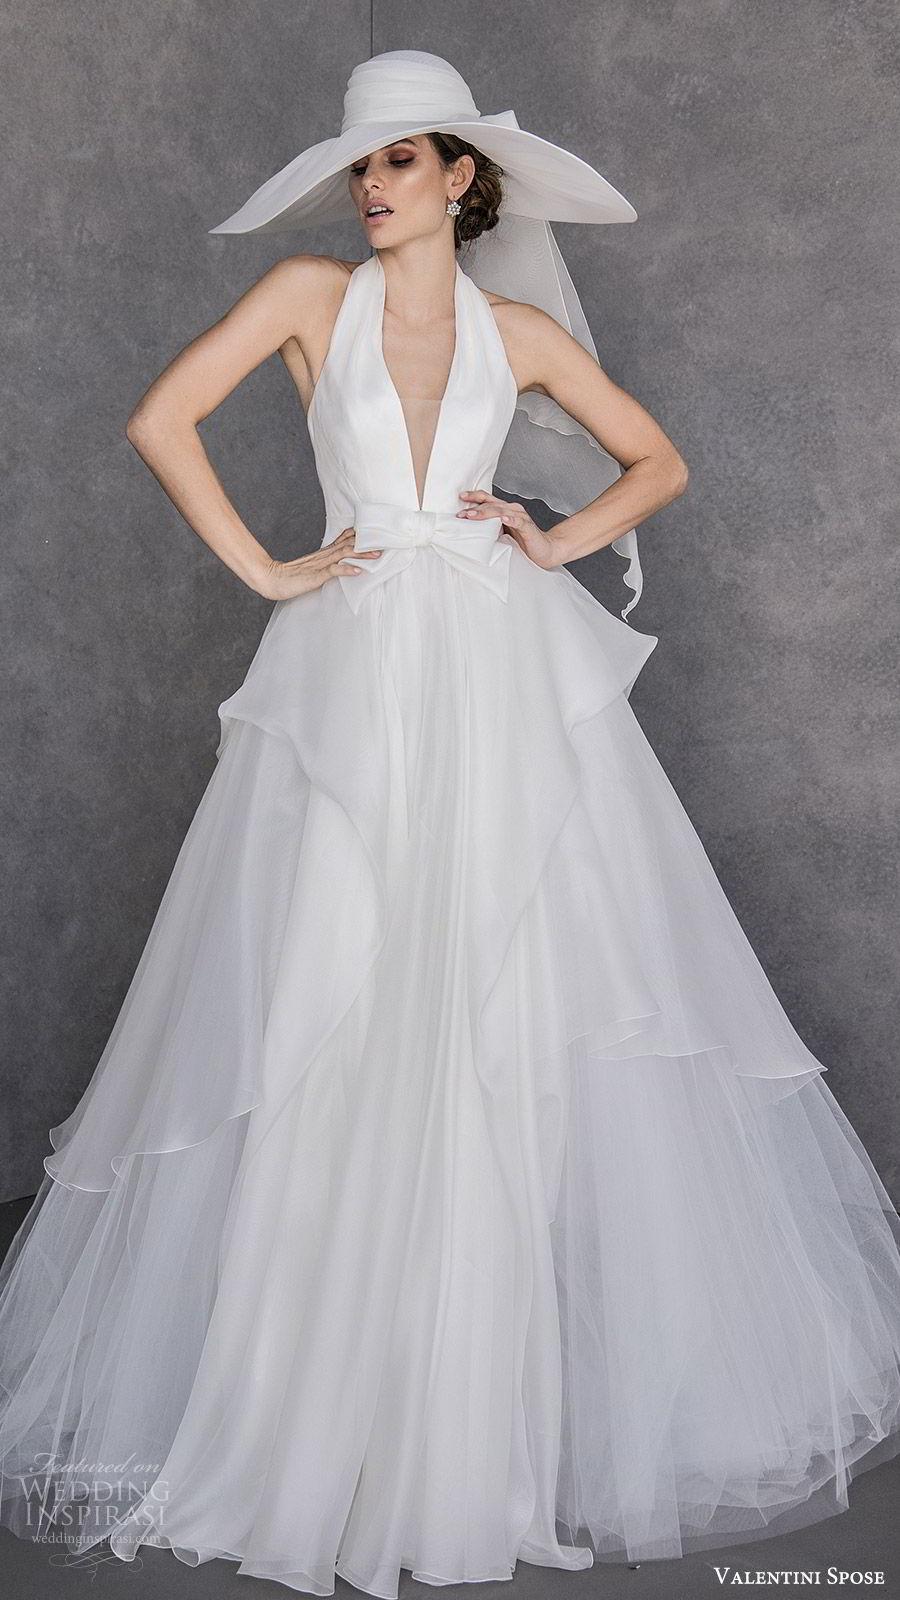 valentini spose spring 2020 bridal sleeveless halter neck deep v neckline a line ball gown wedding dress (23) tiered skirt elegant chic hat chapel train mv